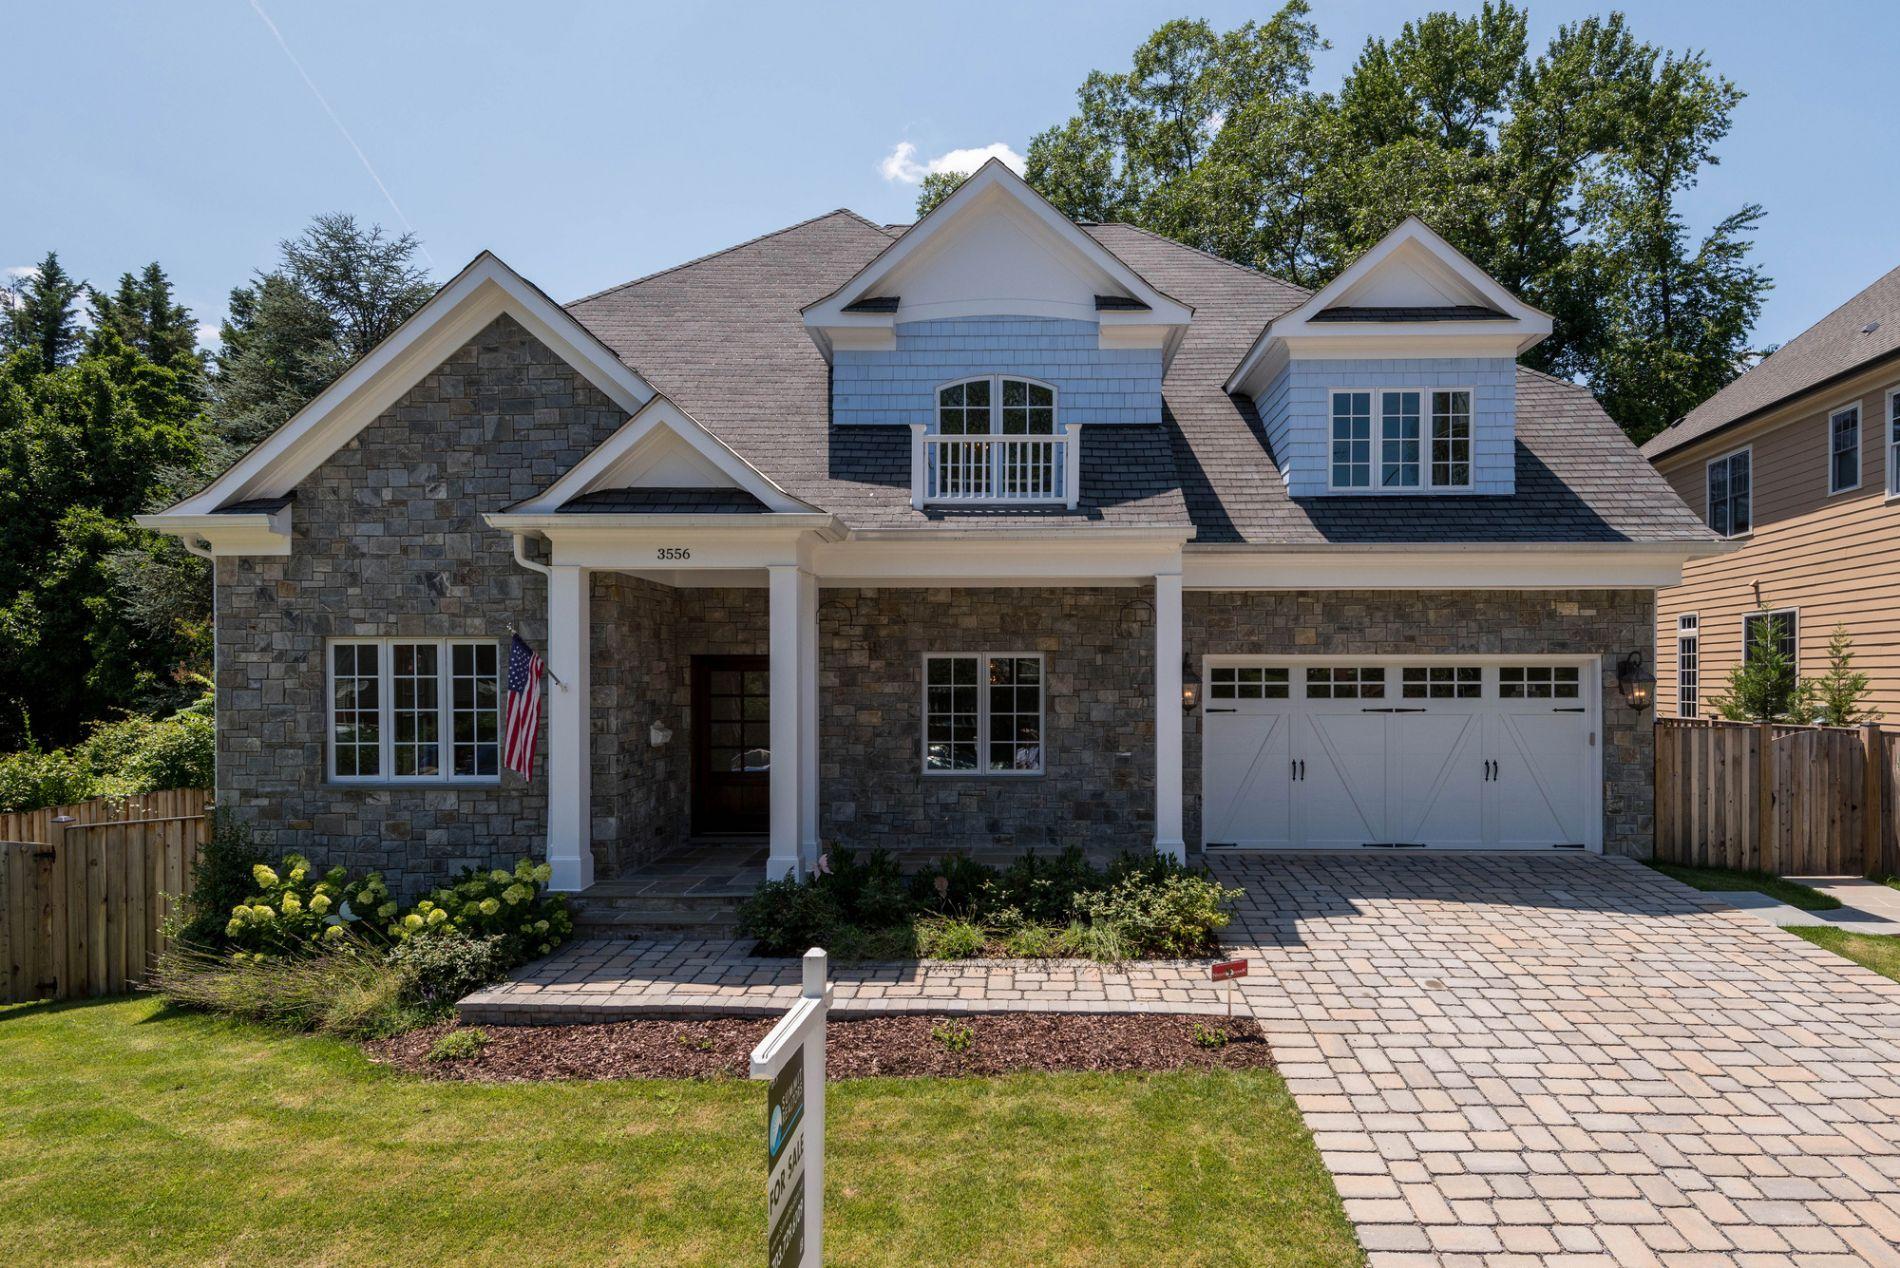 Arlington Home, VA Real Estate Listing